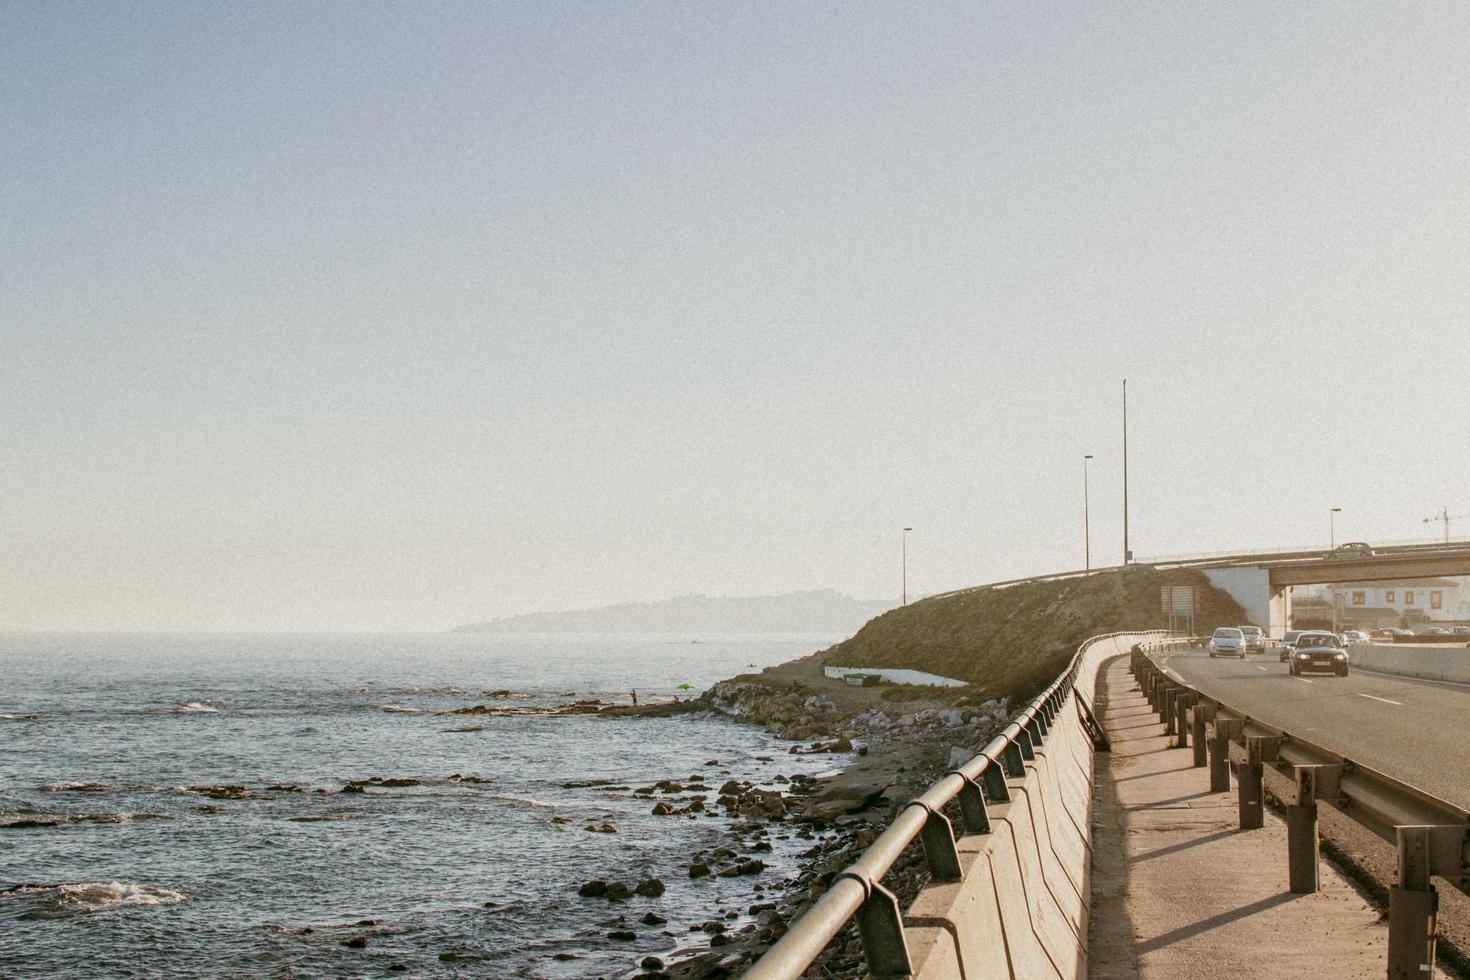 Bridge on coastline photo